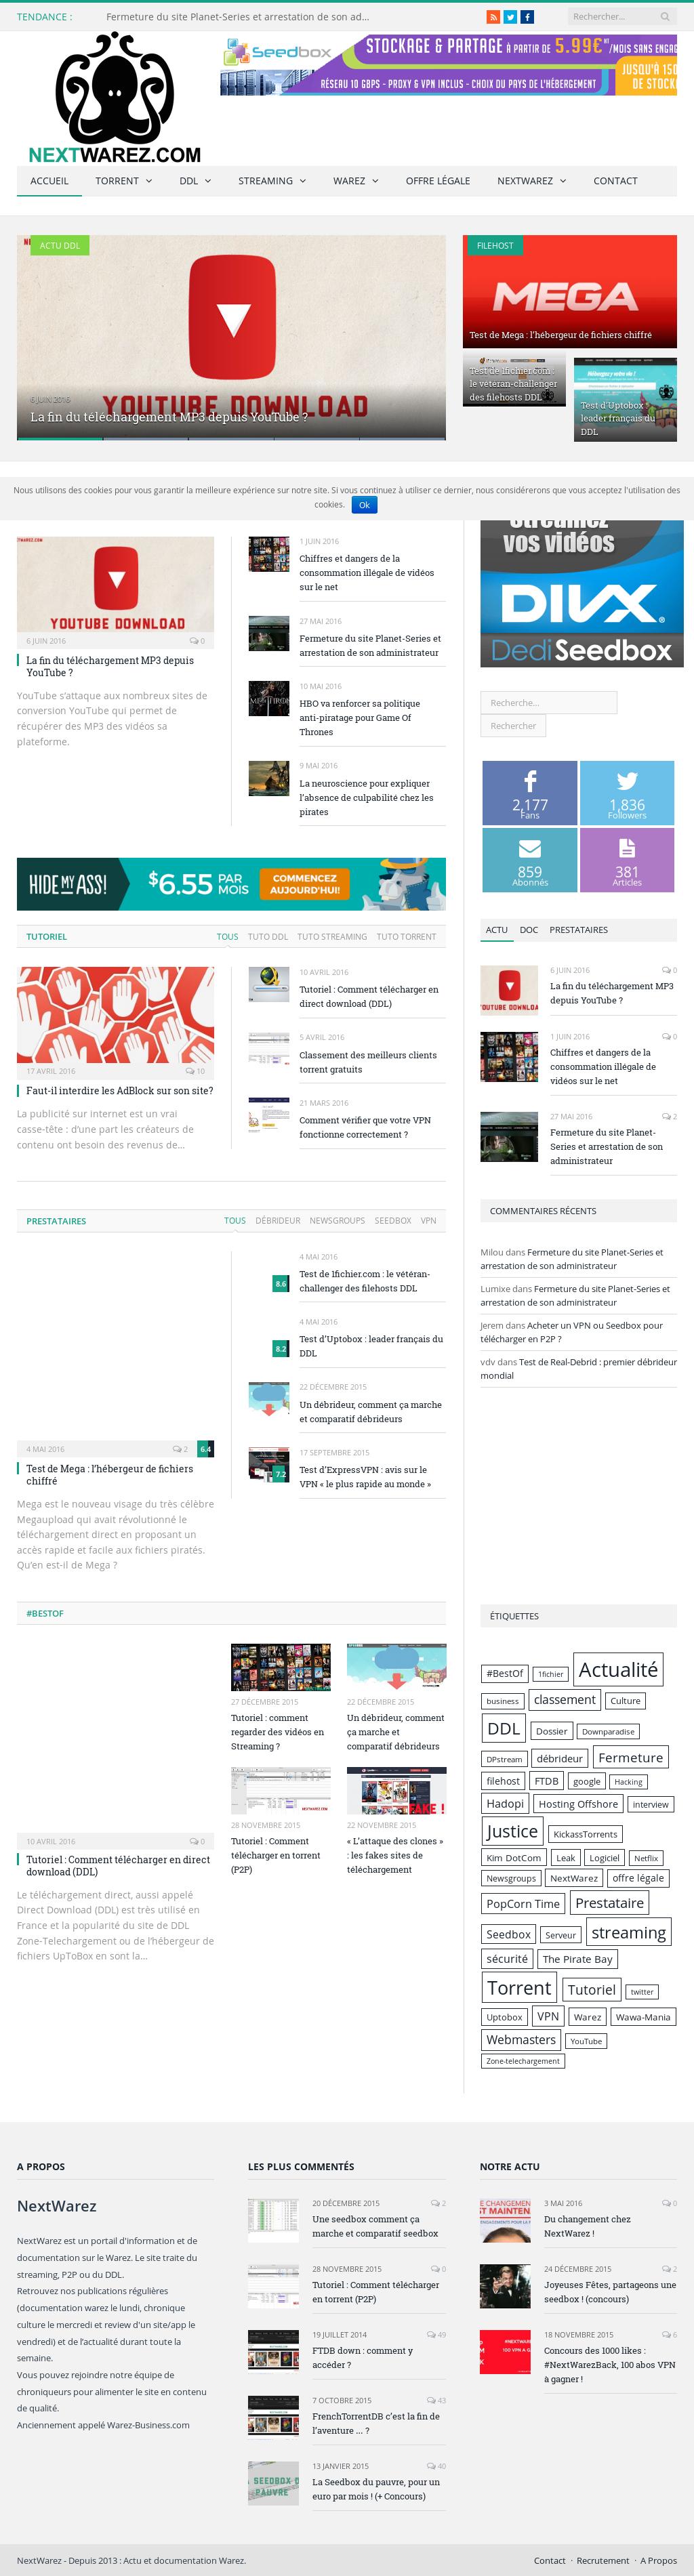 Nextwarez Competitors, Revenue and Employees - Owler Company